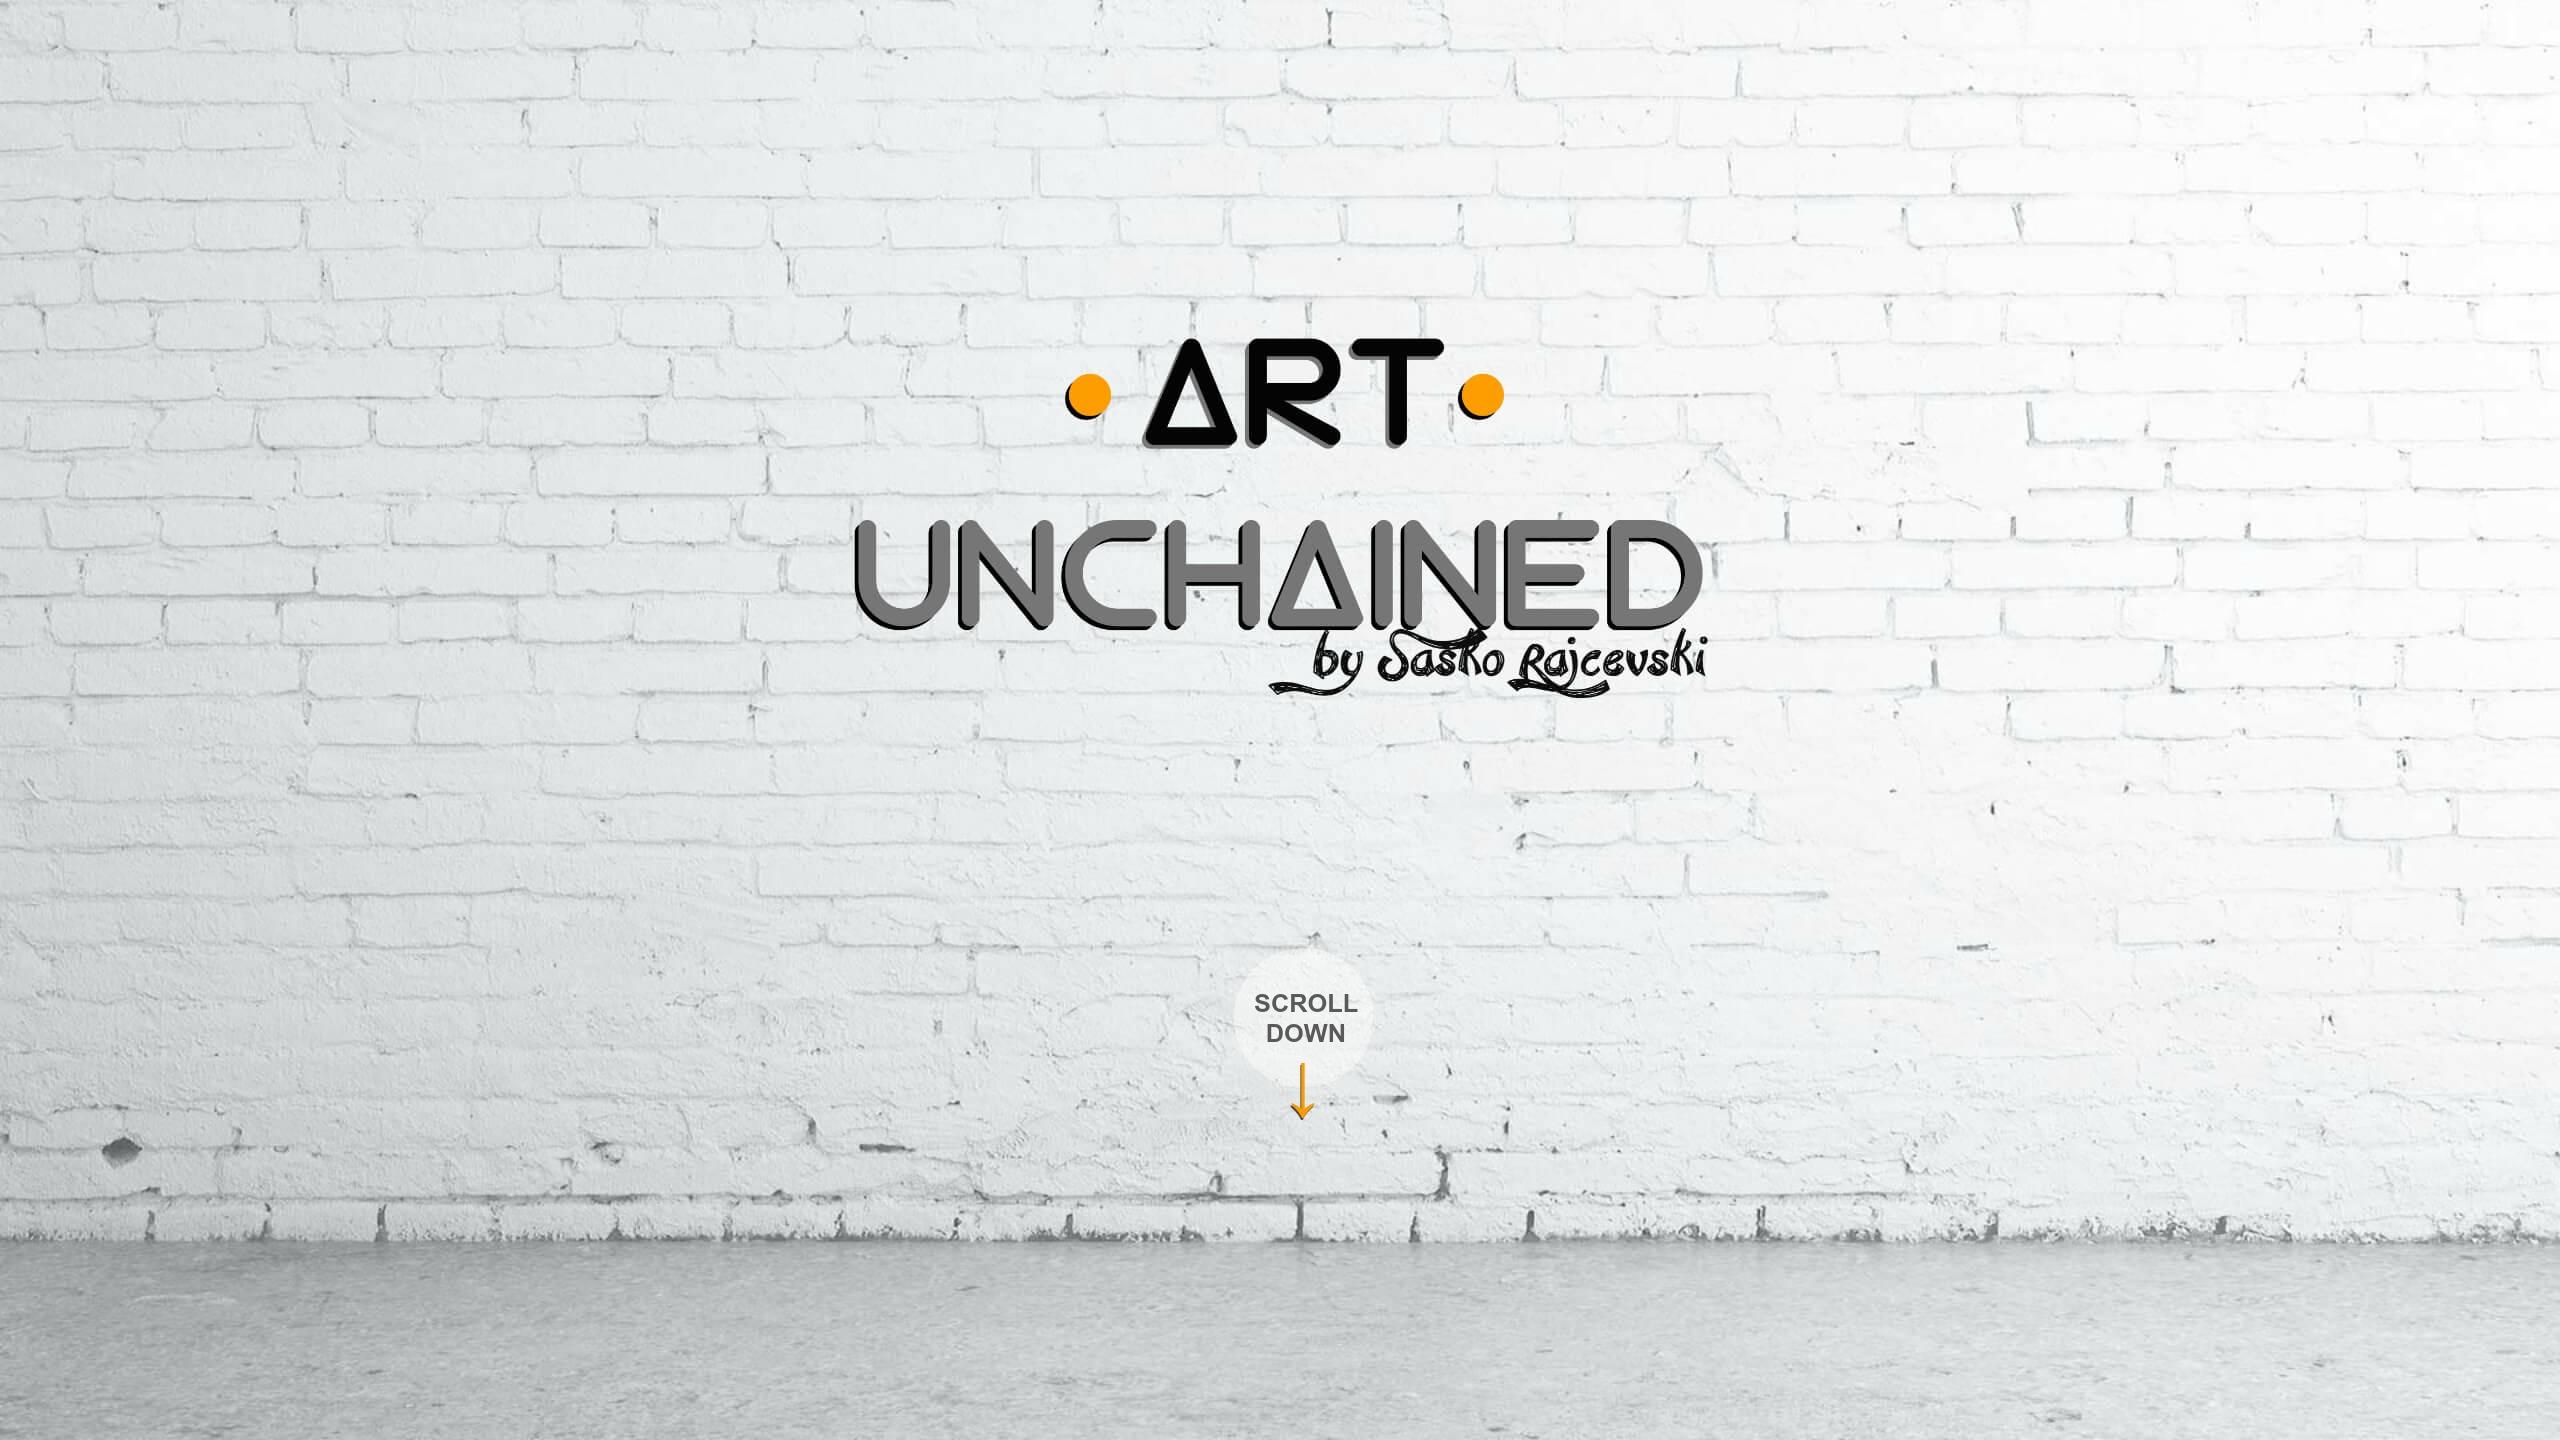 Art Unchained - Entfesselte Kunst by Sasko Rajcevki Homepage large 2560 Centered (1)